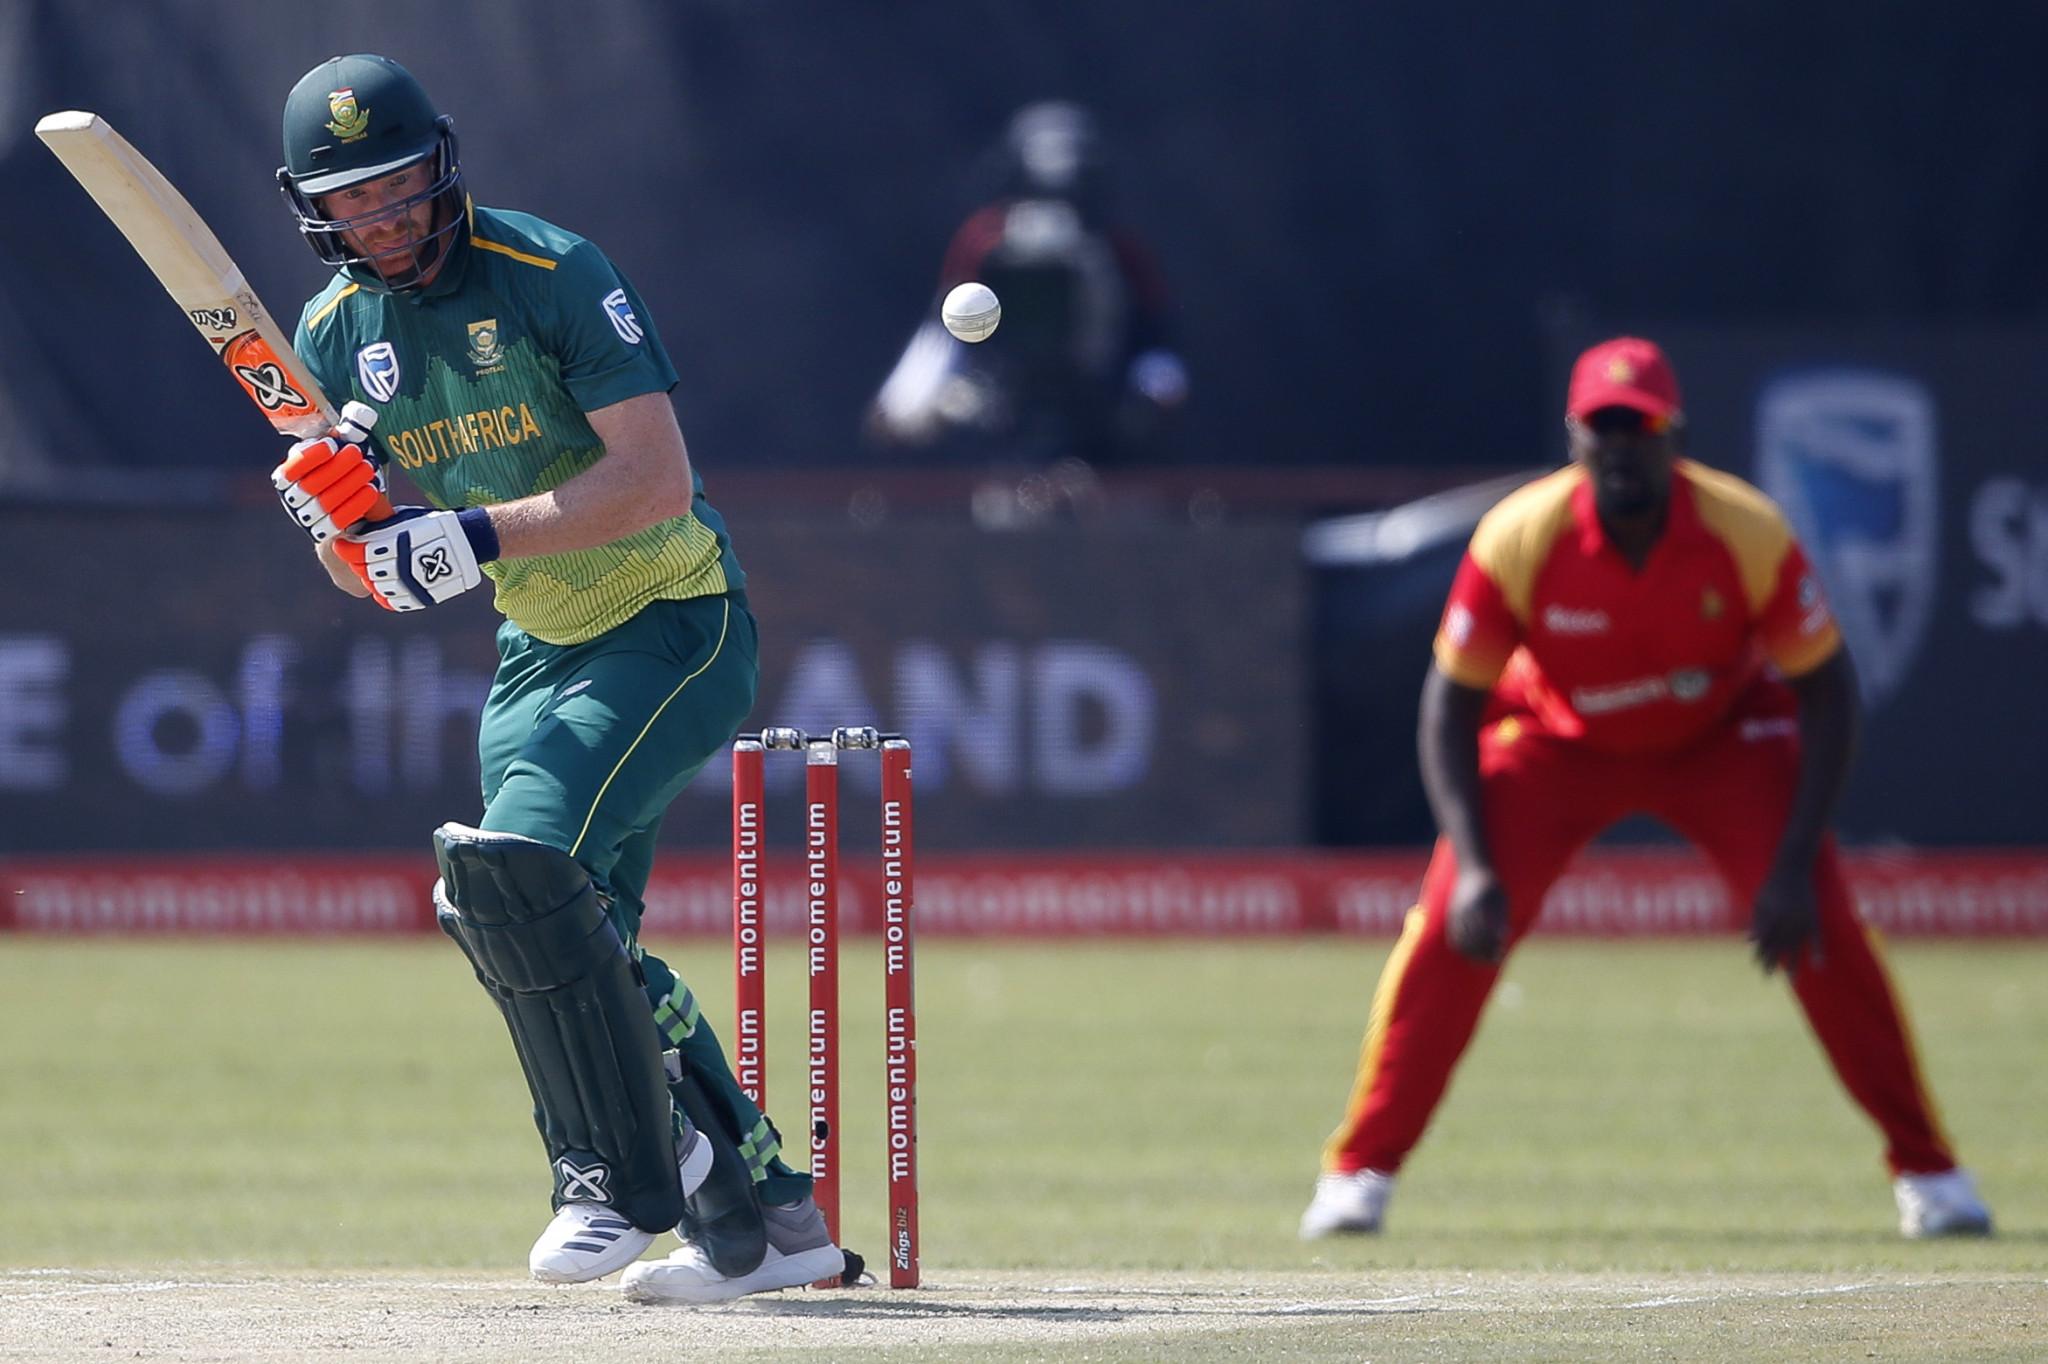 International Cricket Council release new Duckworth-Lewis-Stern scoring method